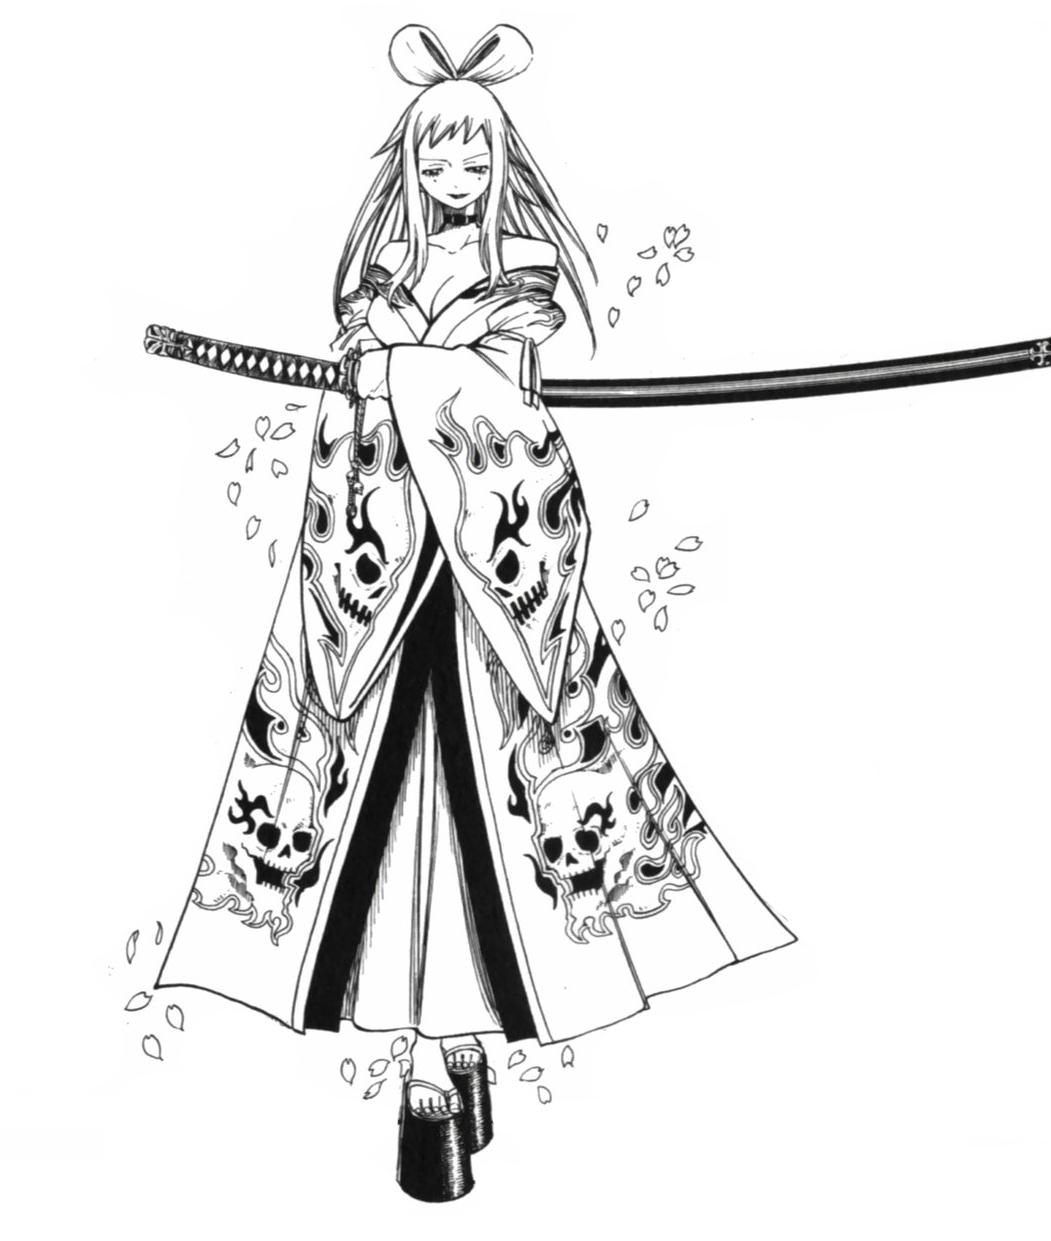 Manga Denizi Fairy Tail 521: Fairy Tail Wiki, The Site For Hiro Mashima's